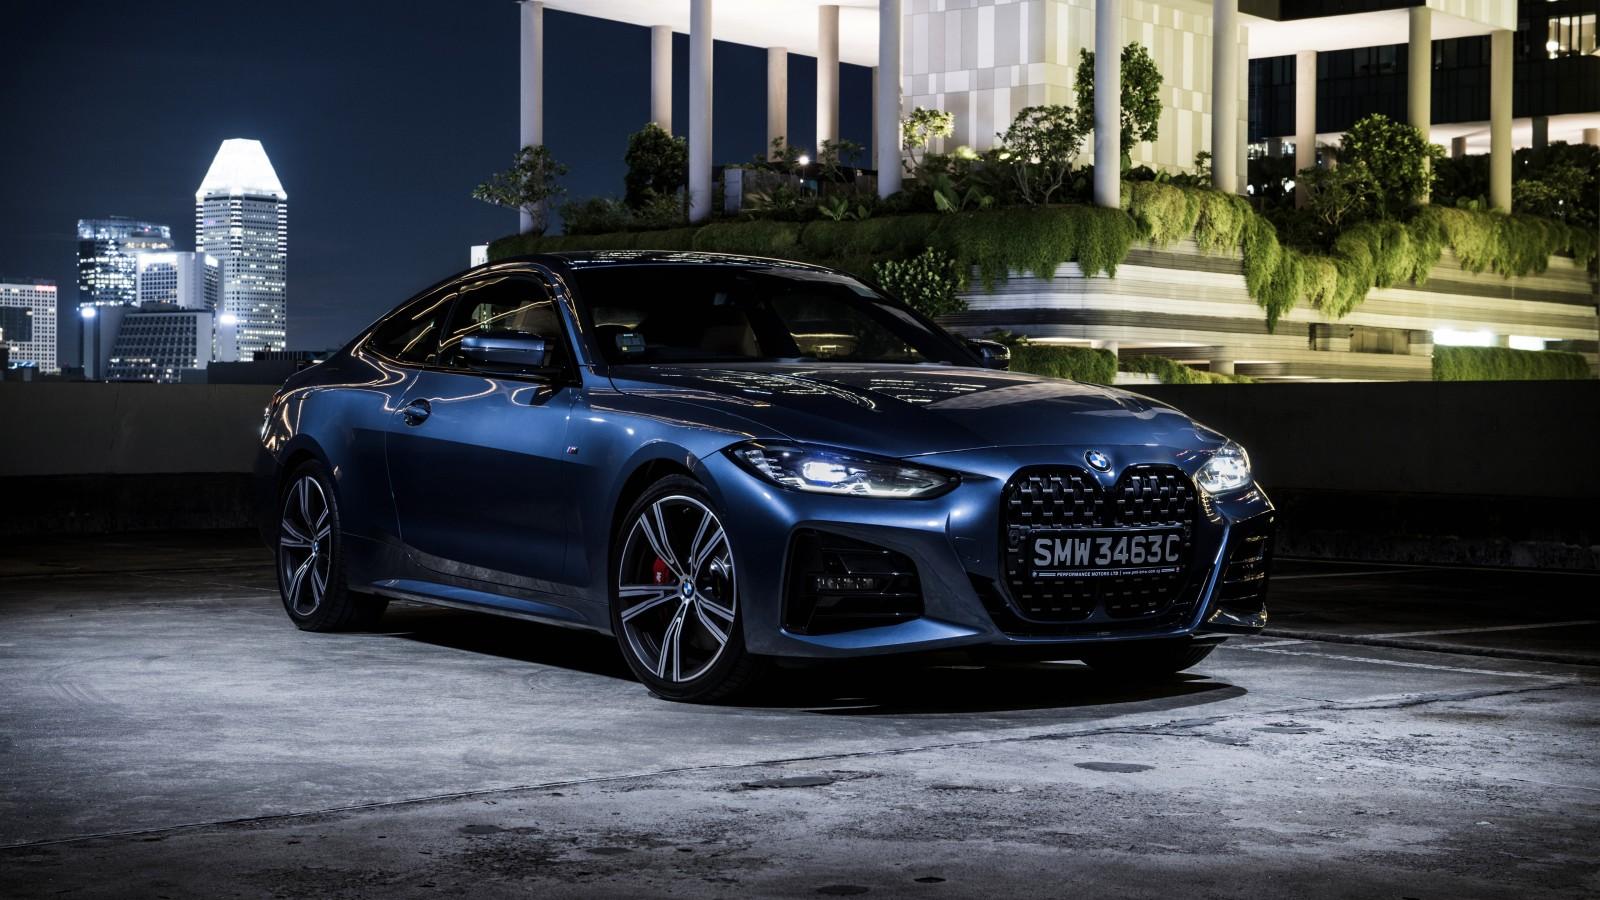 BMW 430i Coup M Sport 2021 5K Wallpaper